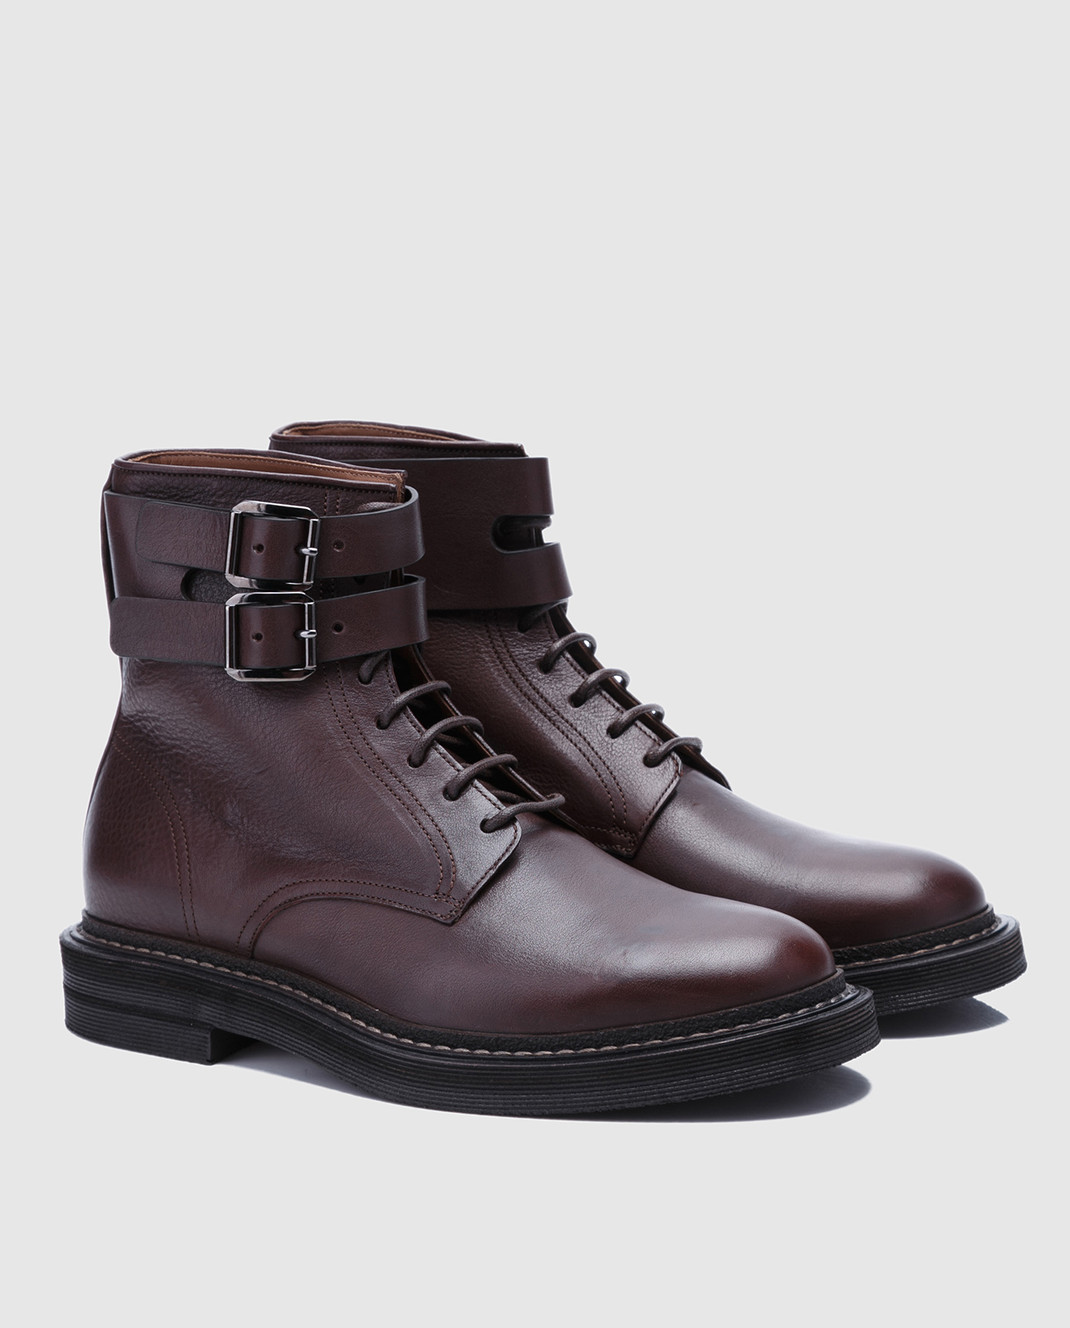 Brunello Cucinelli Темно-коричневые кожаные ботинки MZUSPFU174 изображение 2